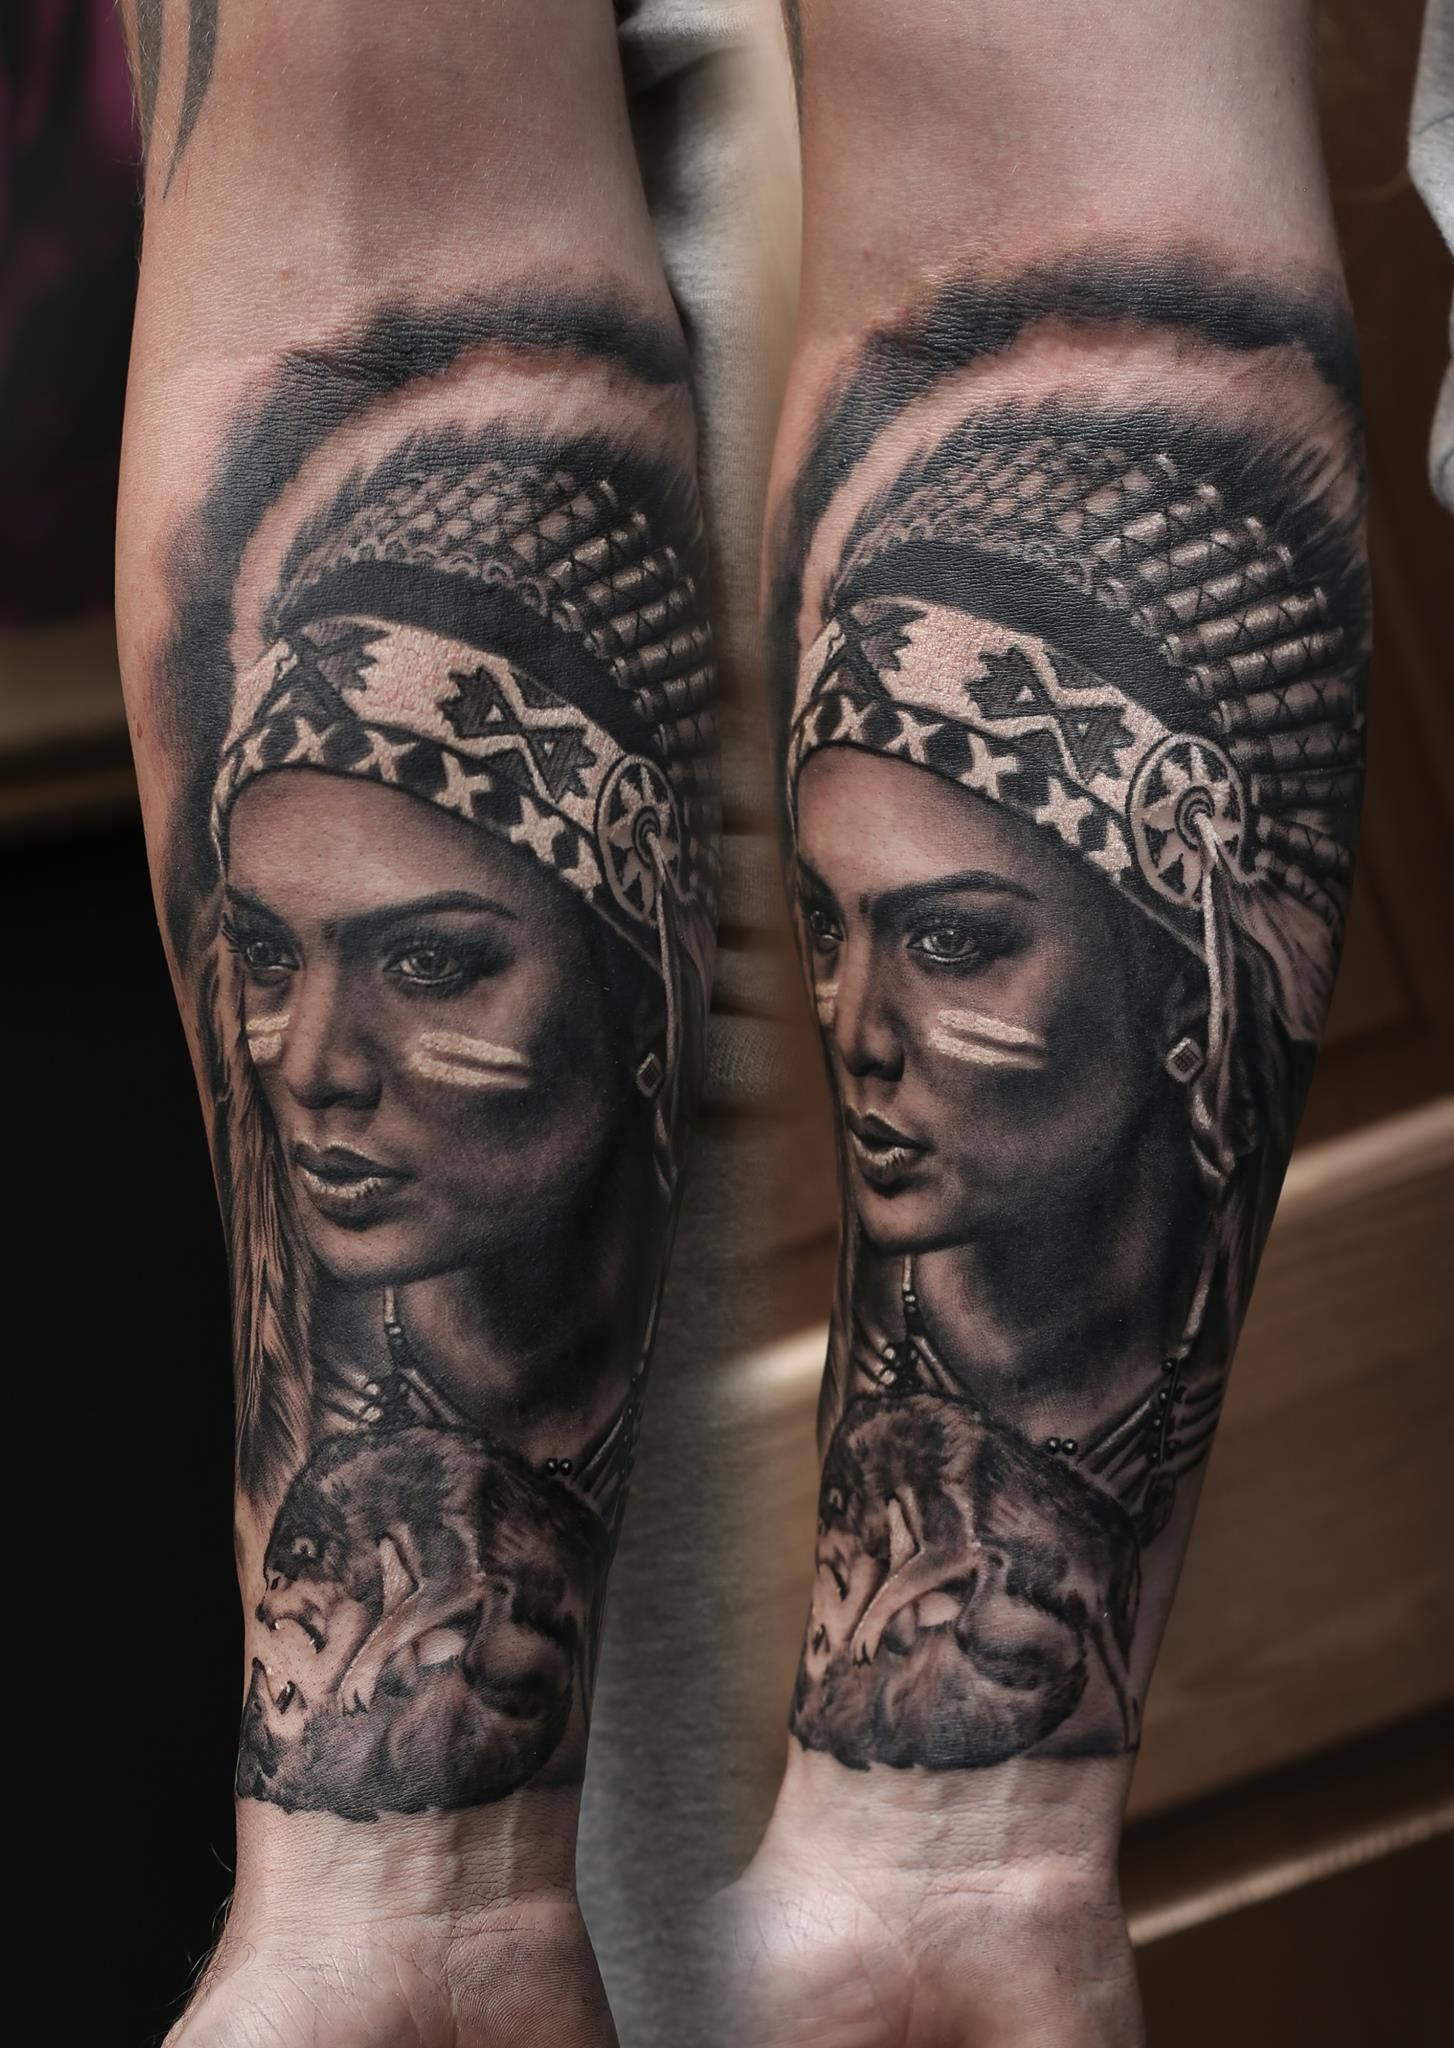 Indian Lady Tattoo Artist Mindy Artist Mindy Www Holytrinitytattoos Co Uk Holytrinity Native American Girl Tattoo Native American Girls Girl Tattoos